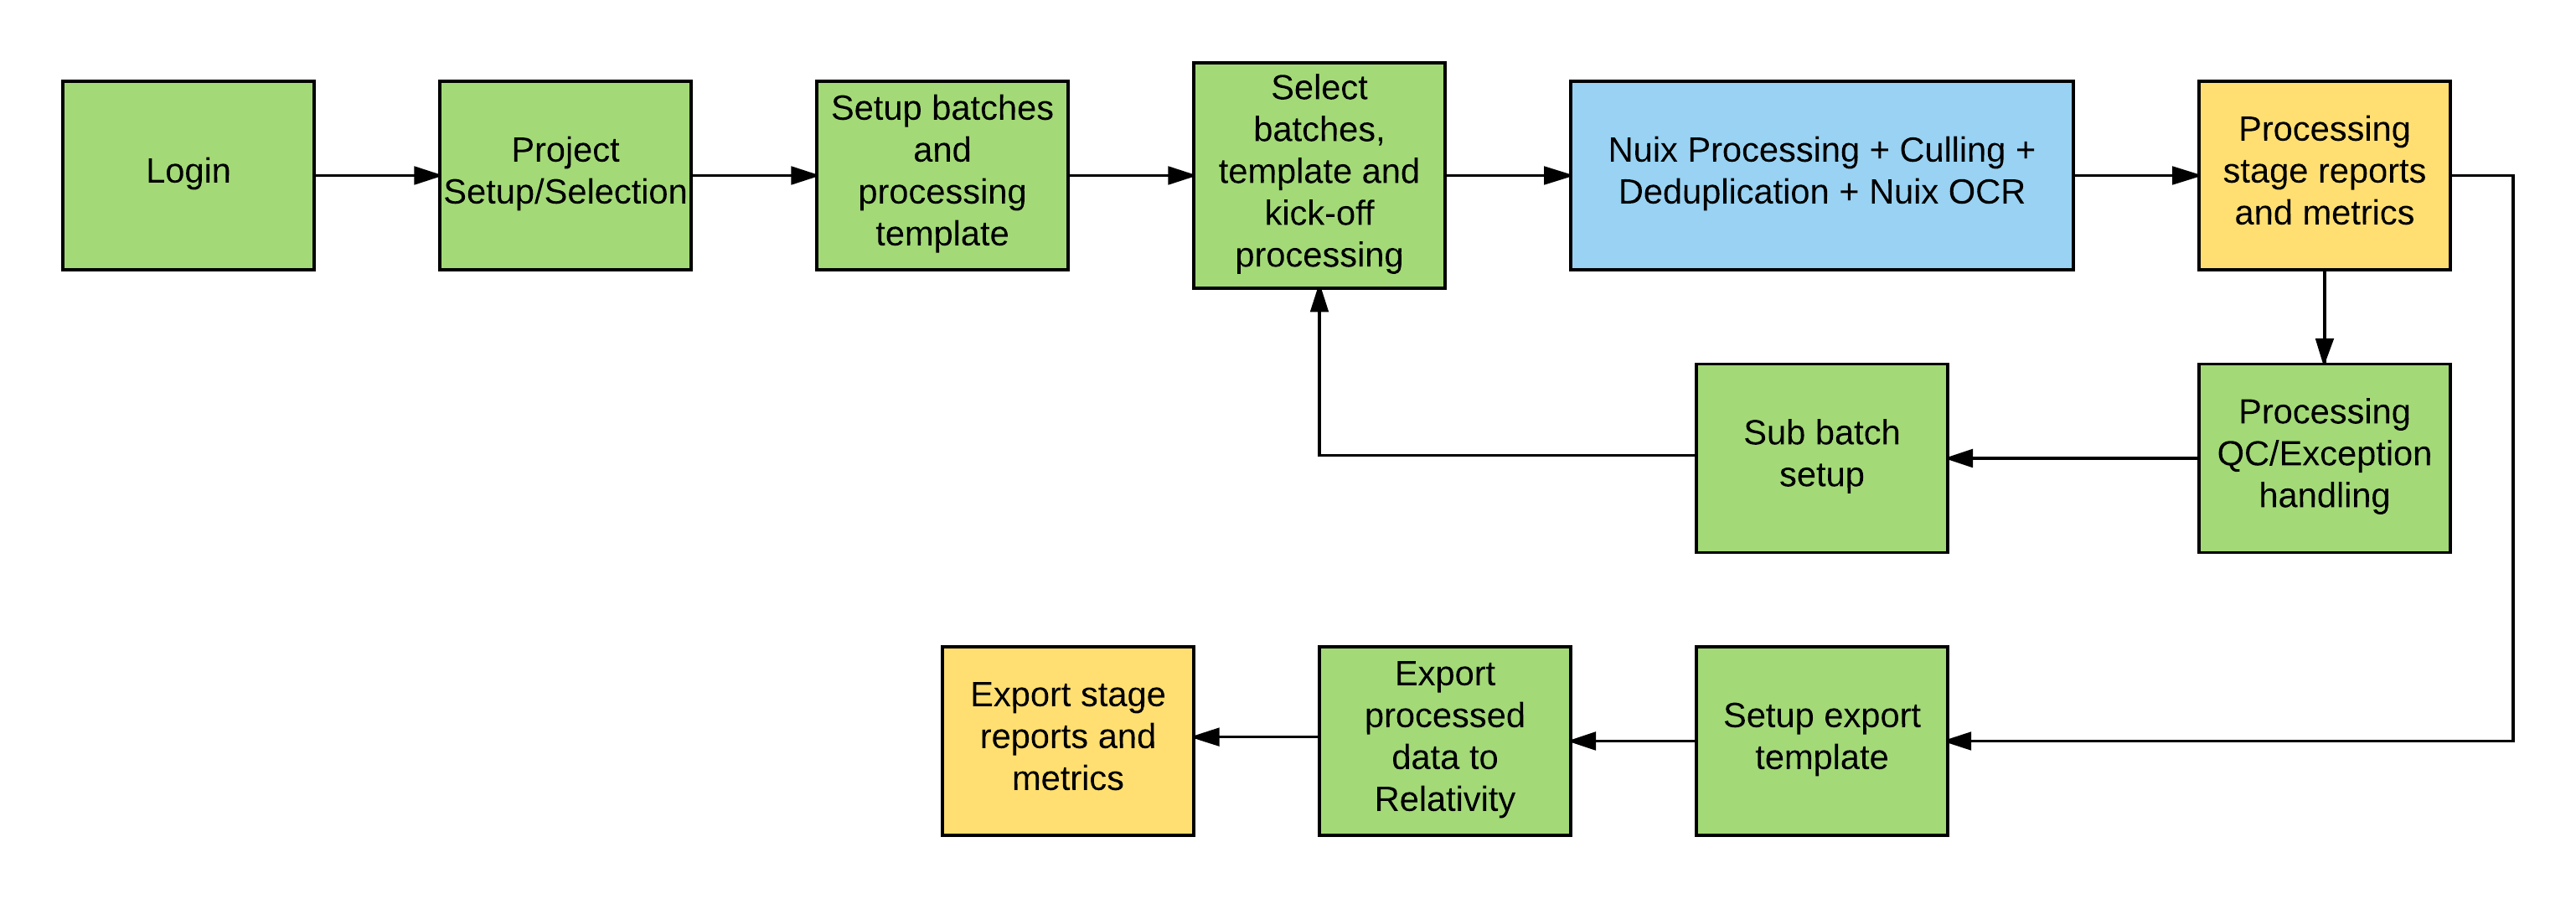 ReNu high level process workflow